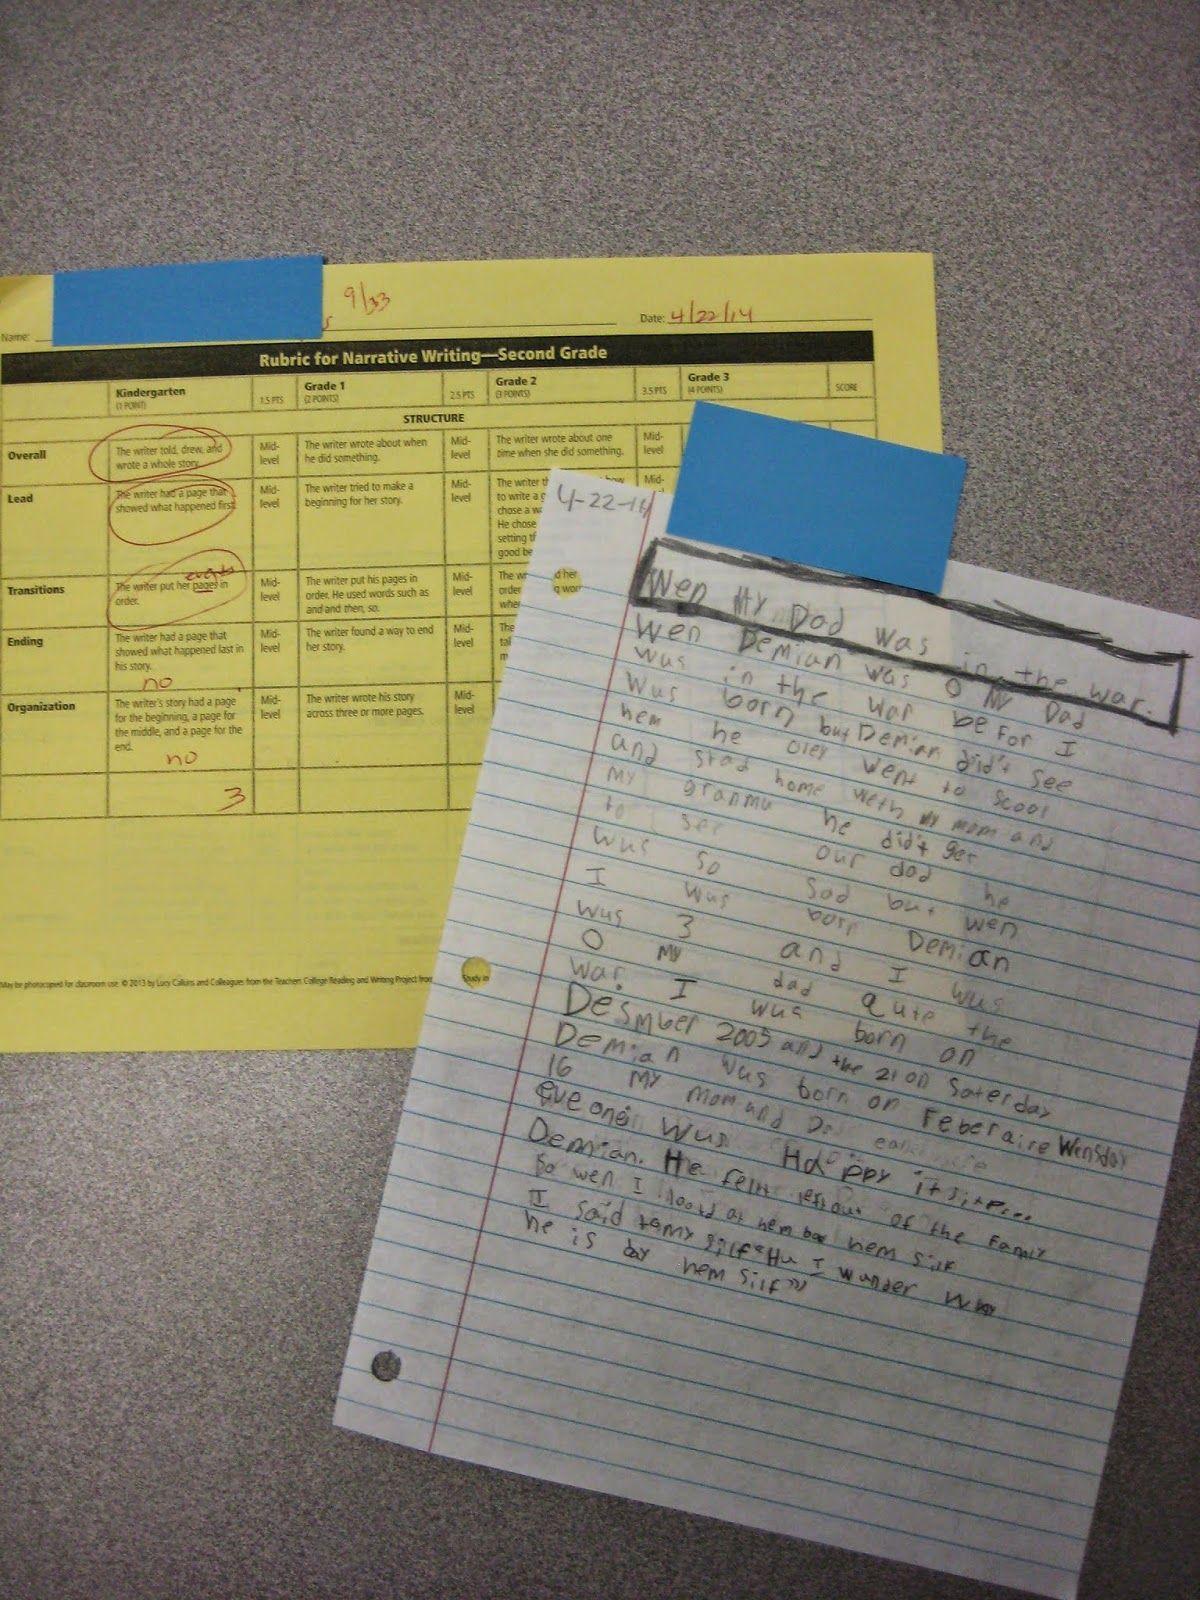 College Application Essay Help Online Margaret Metzger